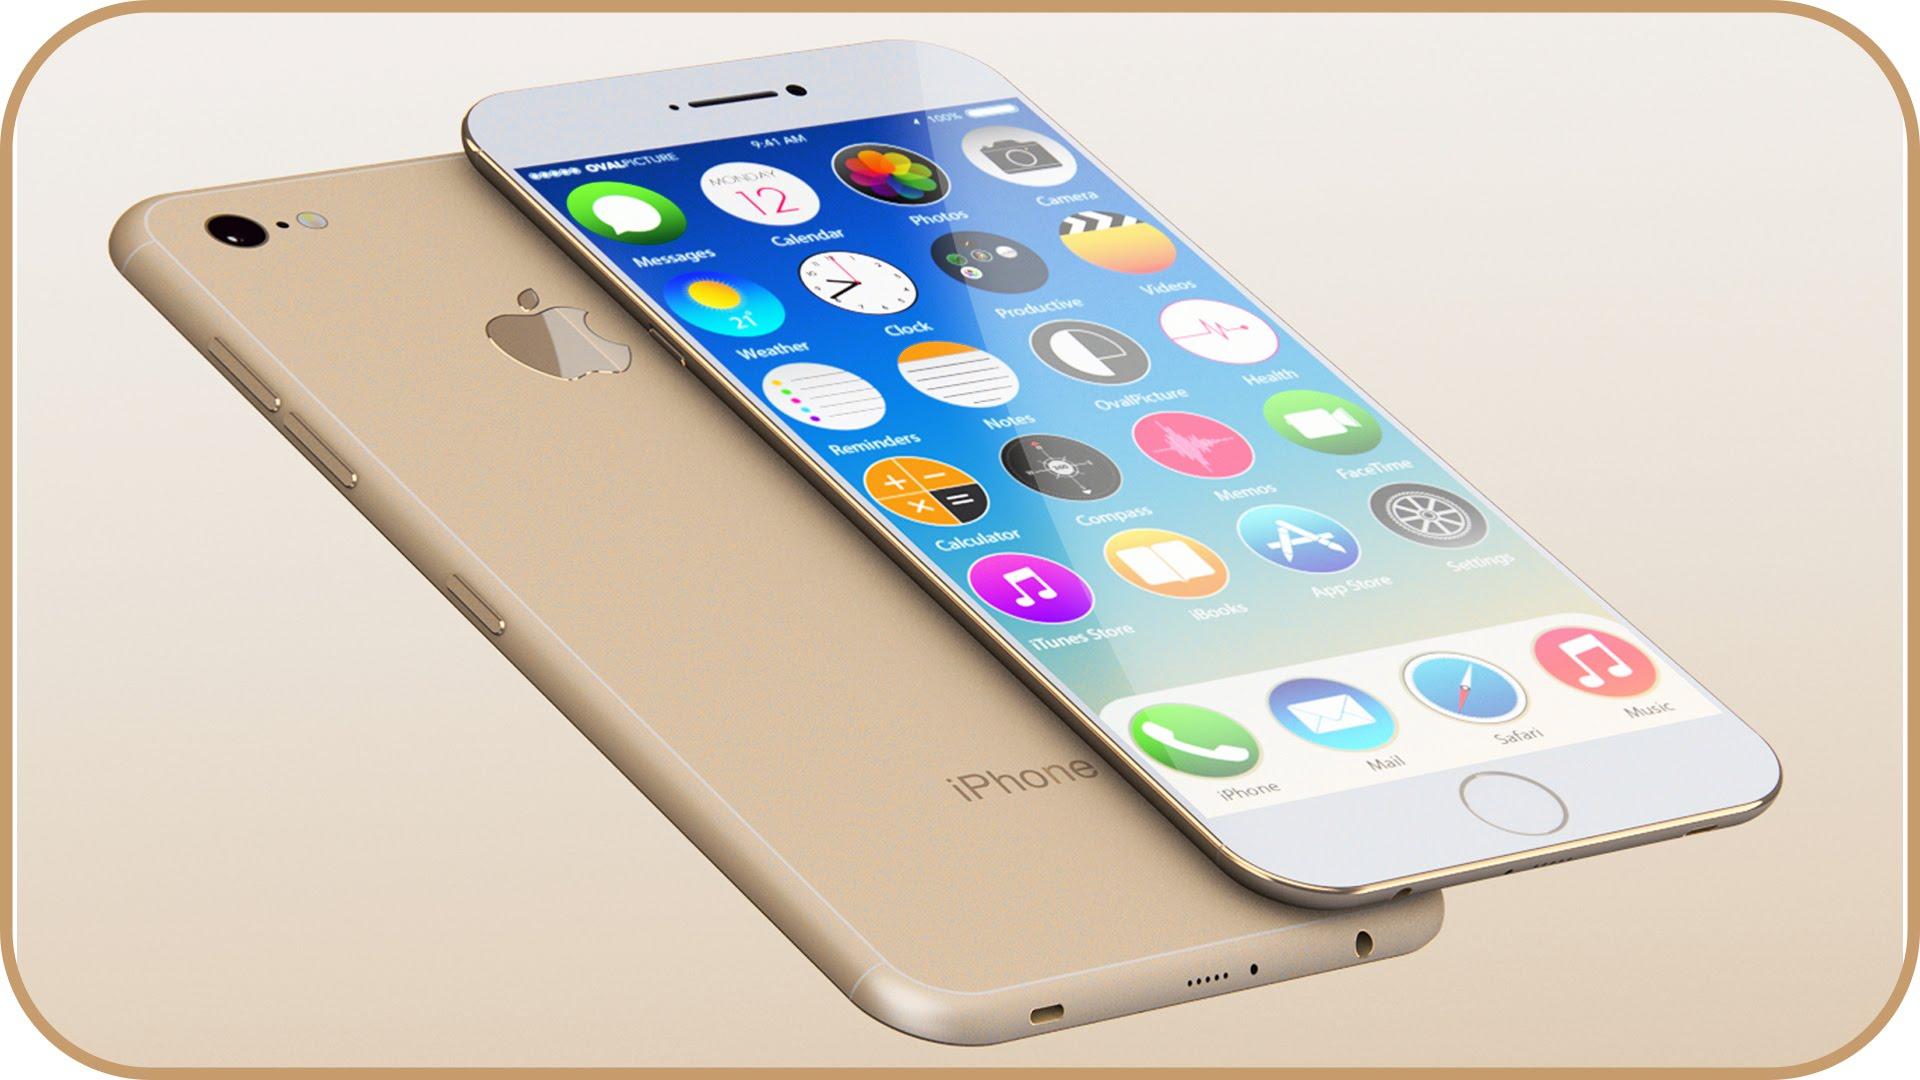 iPhone 7: Πότε έρχεται στην Ελλάδα, πόσο θα κοστίζει!